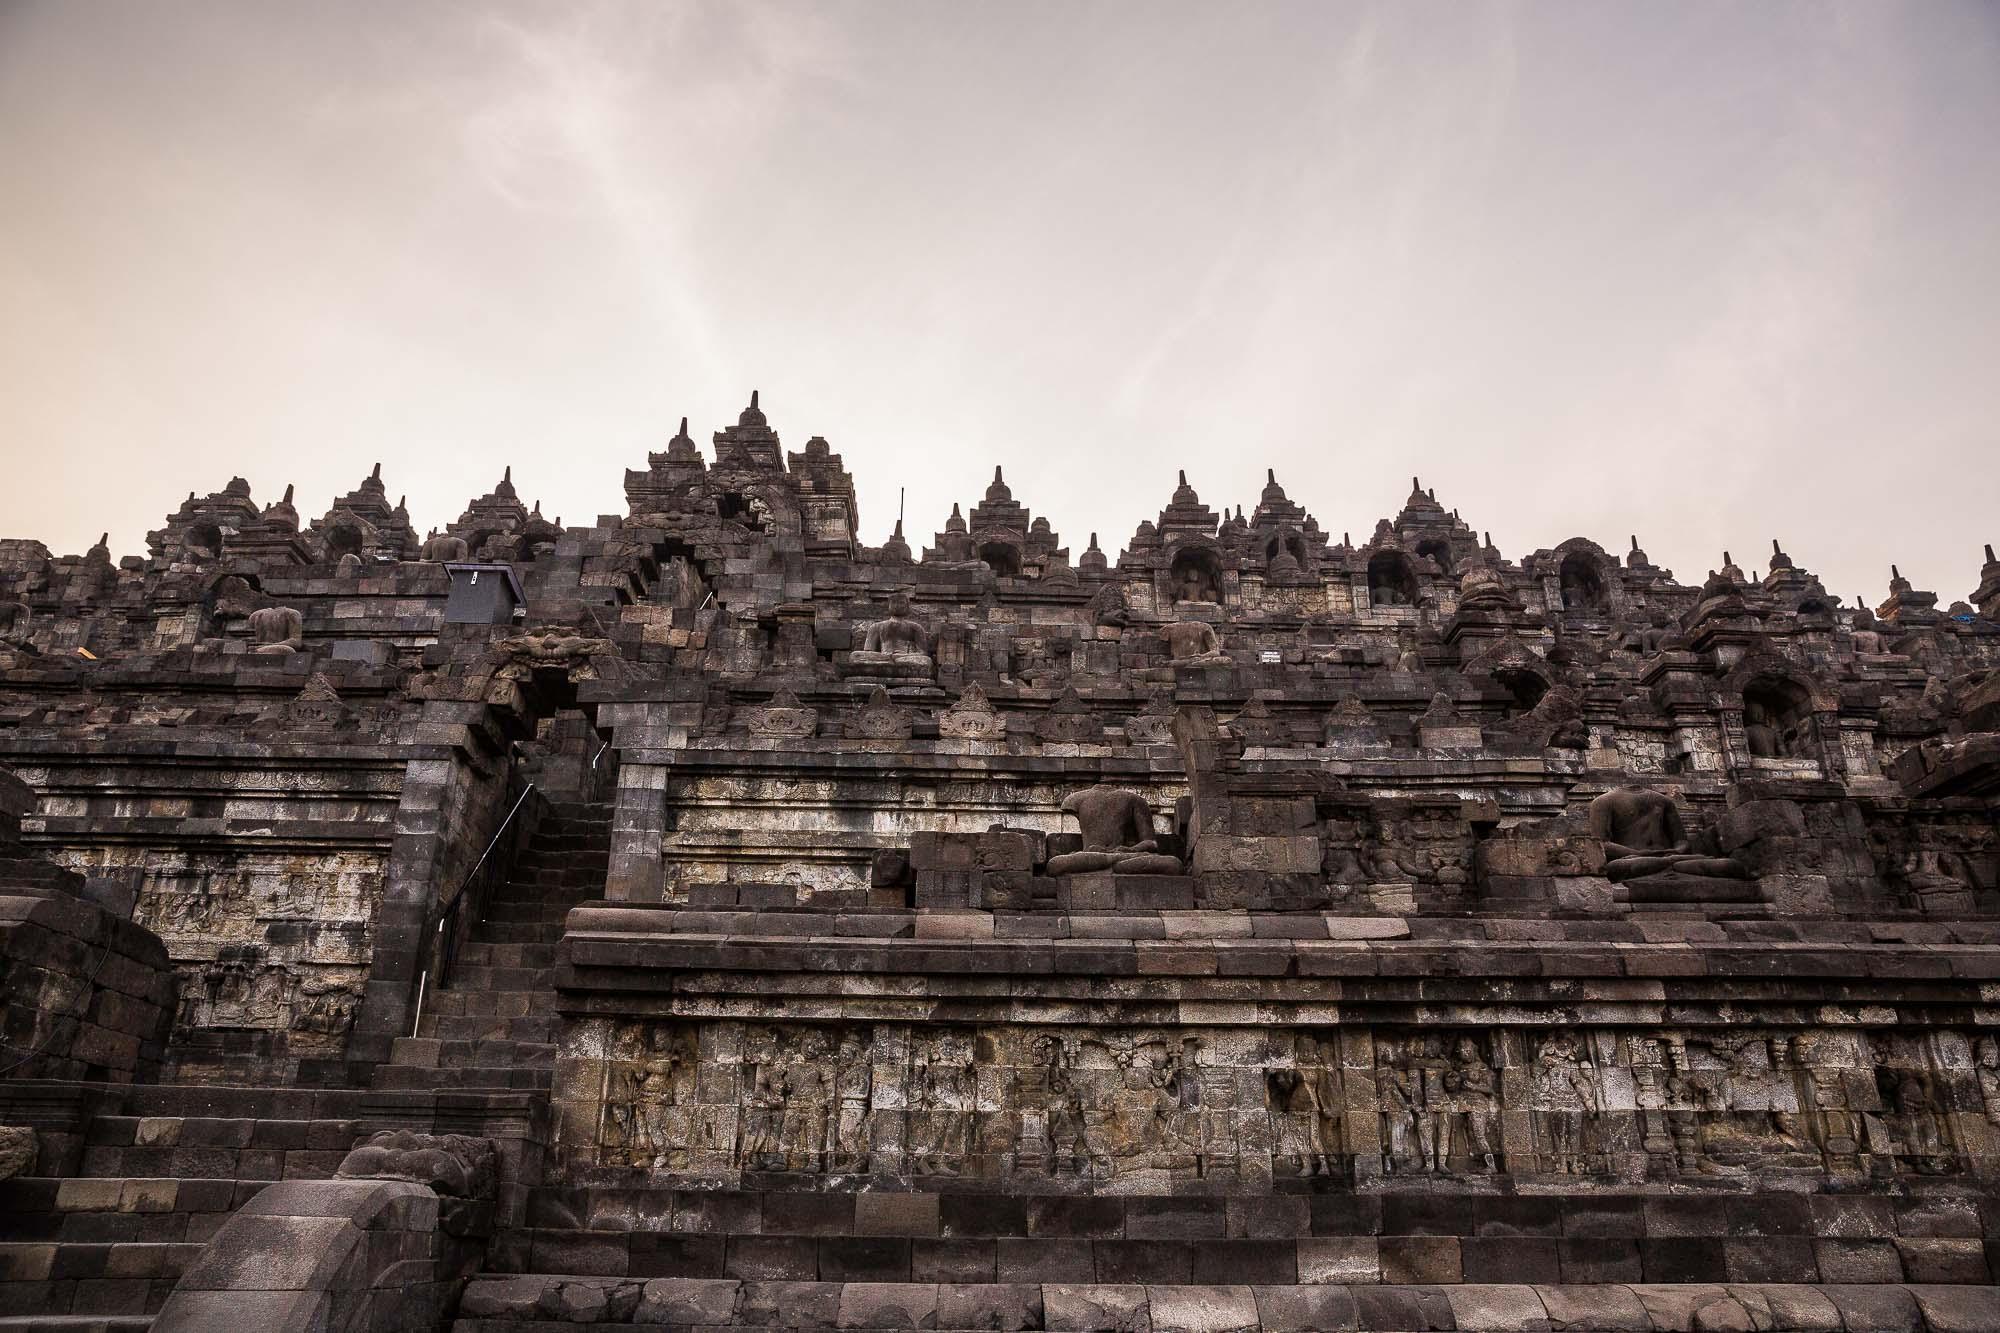 INDONESIA_2015_02 BOROBODUR-PRAMBANAN-YOGYA_JusMedic_181